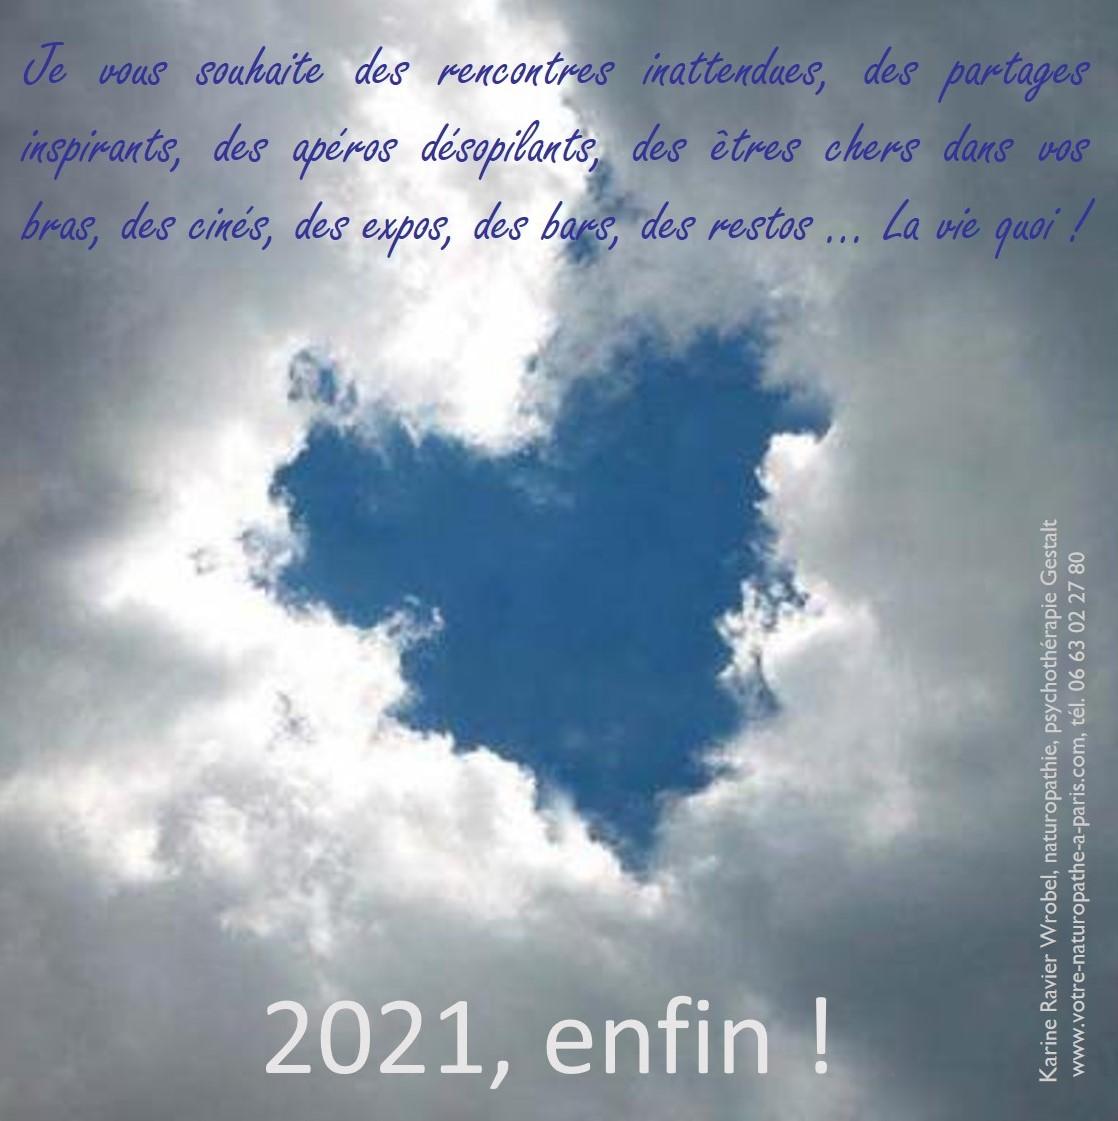 Voeux 2021 naturo.jpg